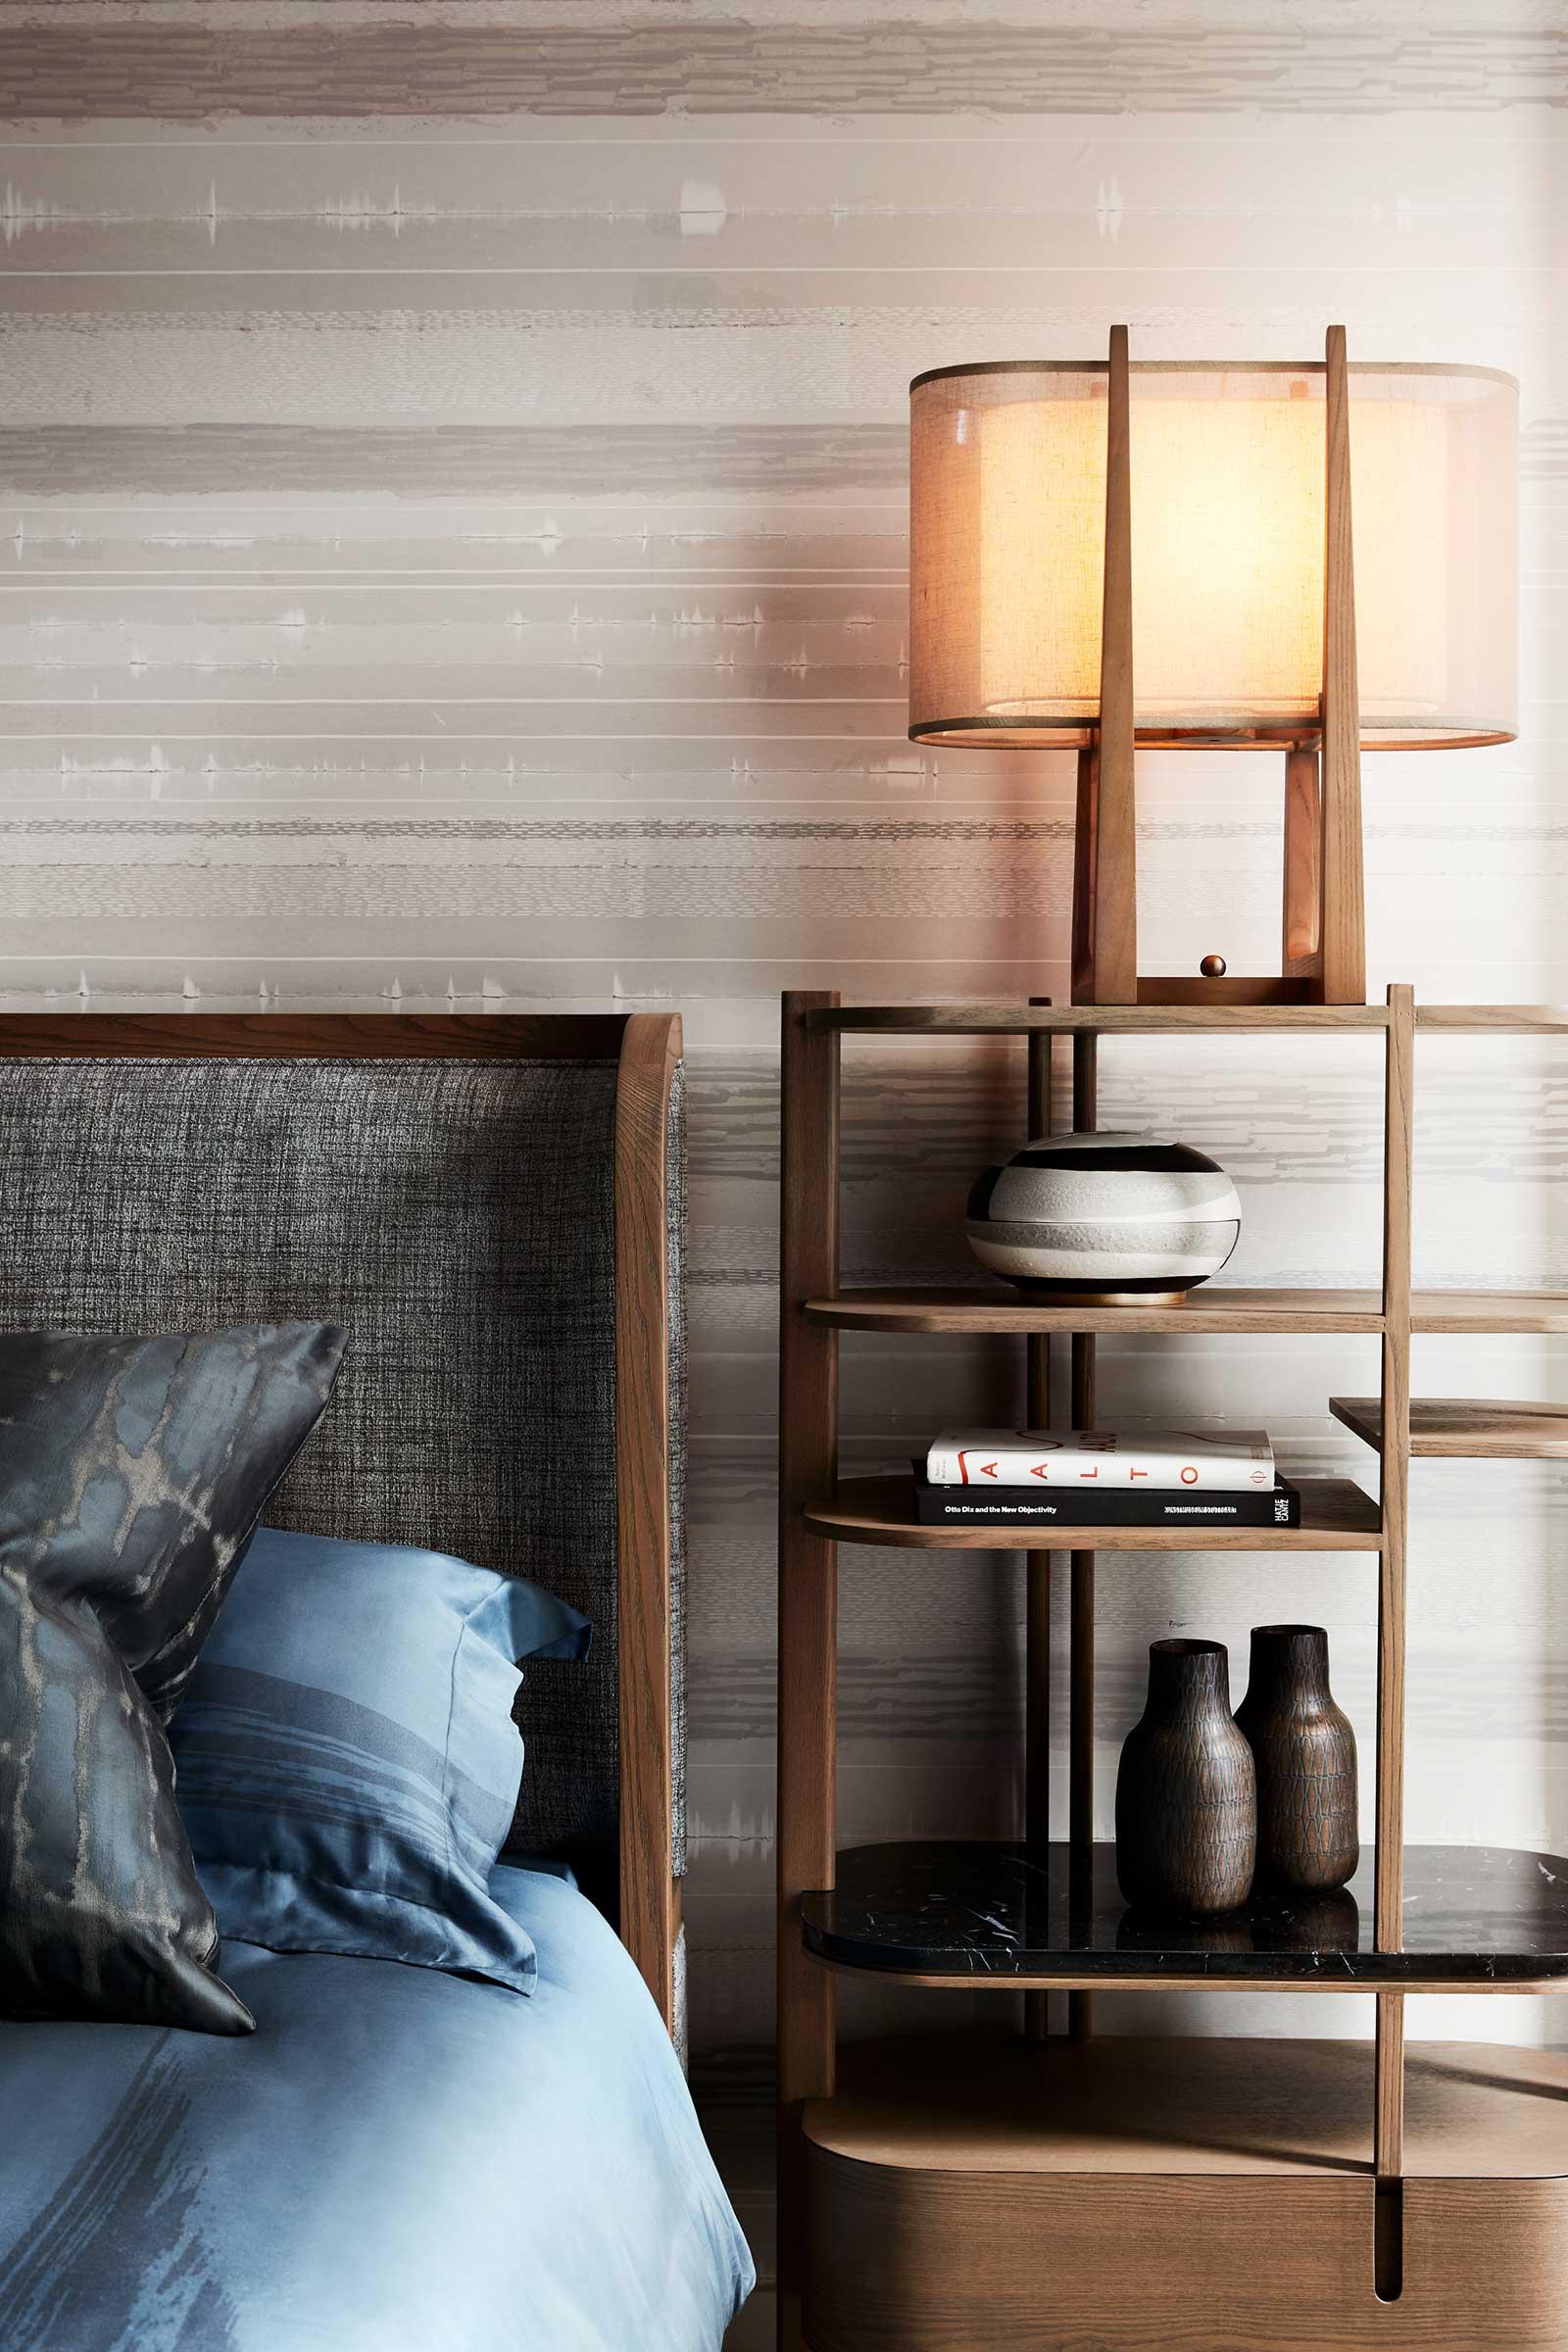 53W53-Master-Bedroom-Detail_credit-Stephen-Kent-Johnson.jpg